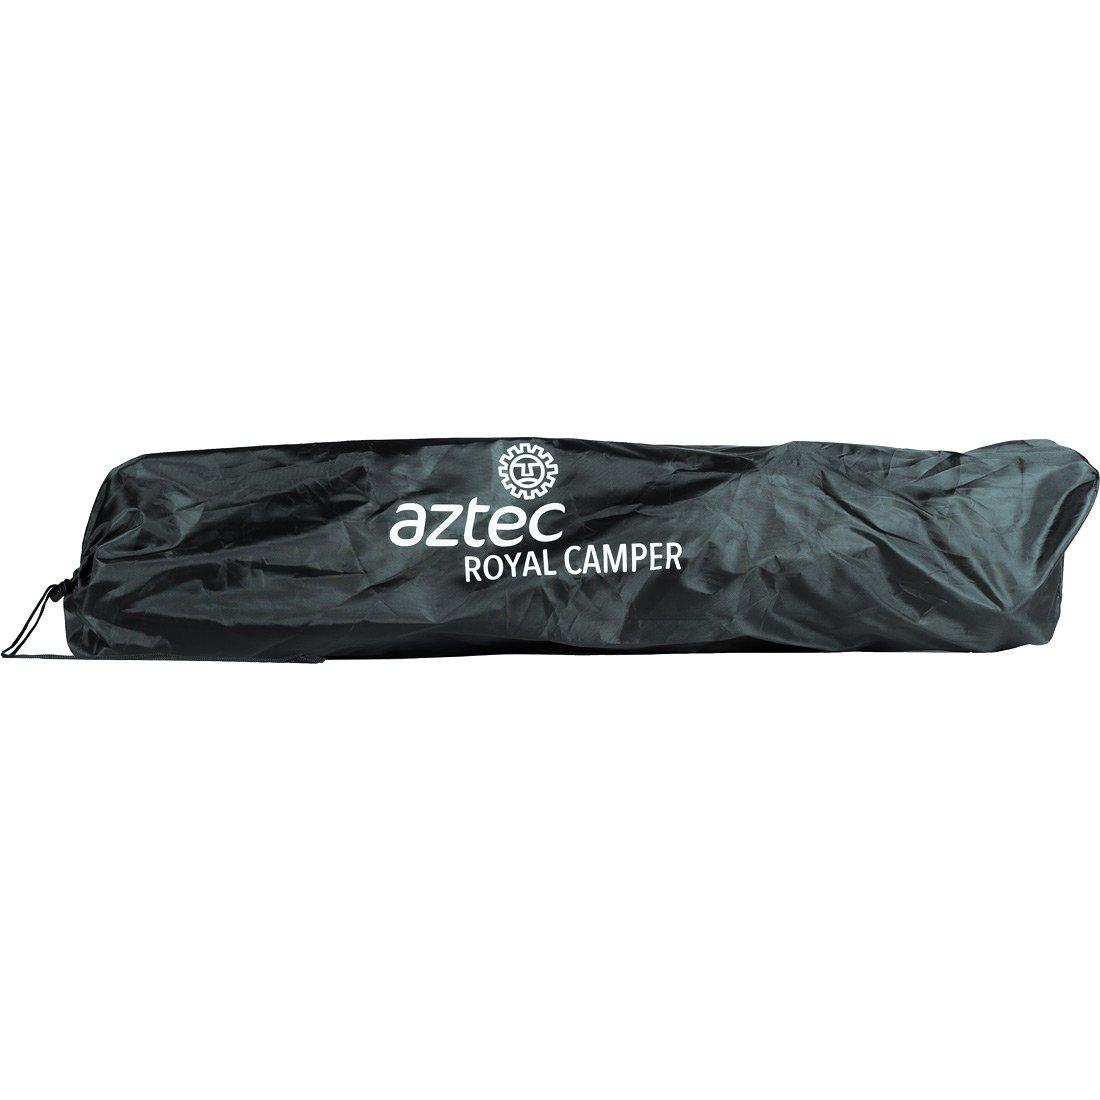 כיסא קמפינג מתקפל - Royal Camper - Aztec